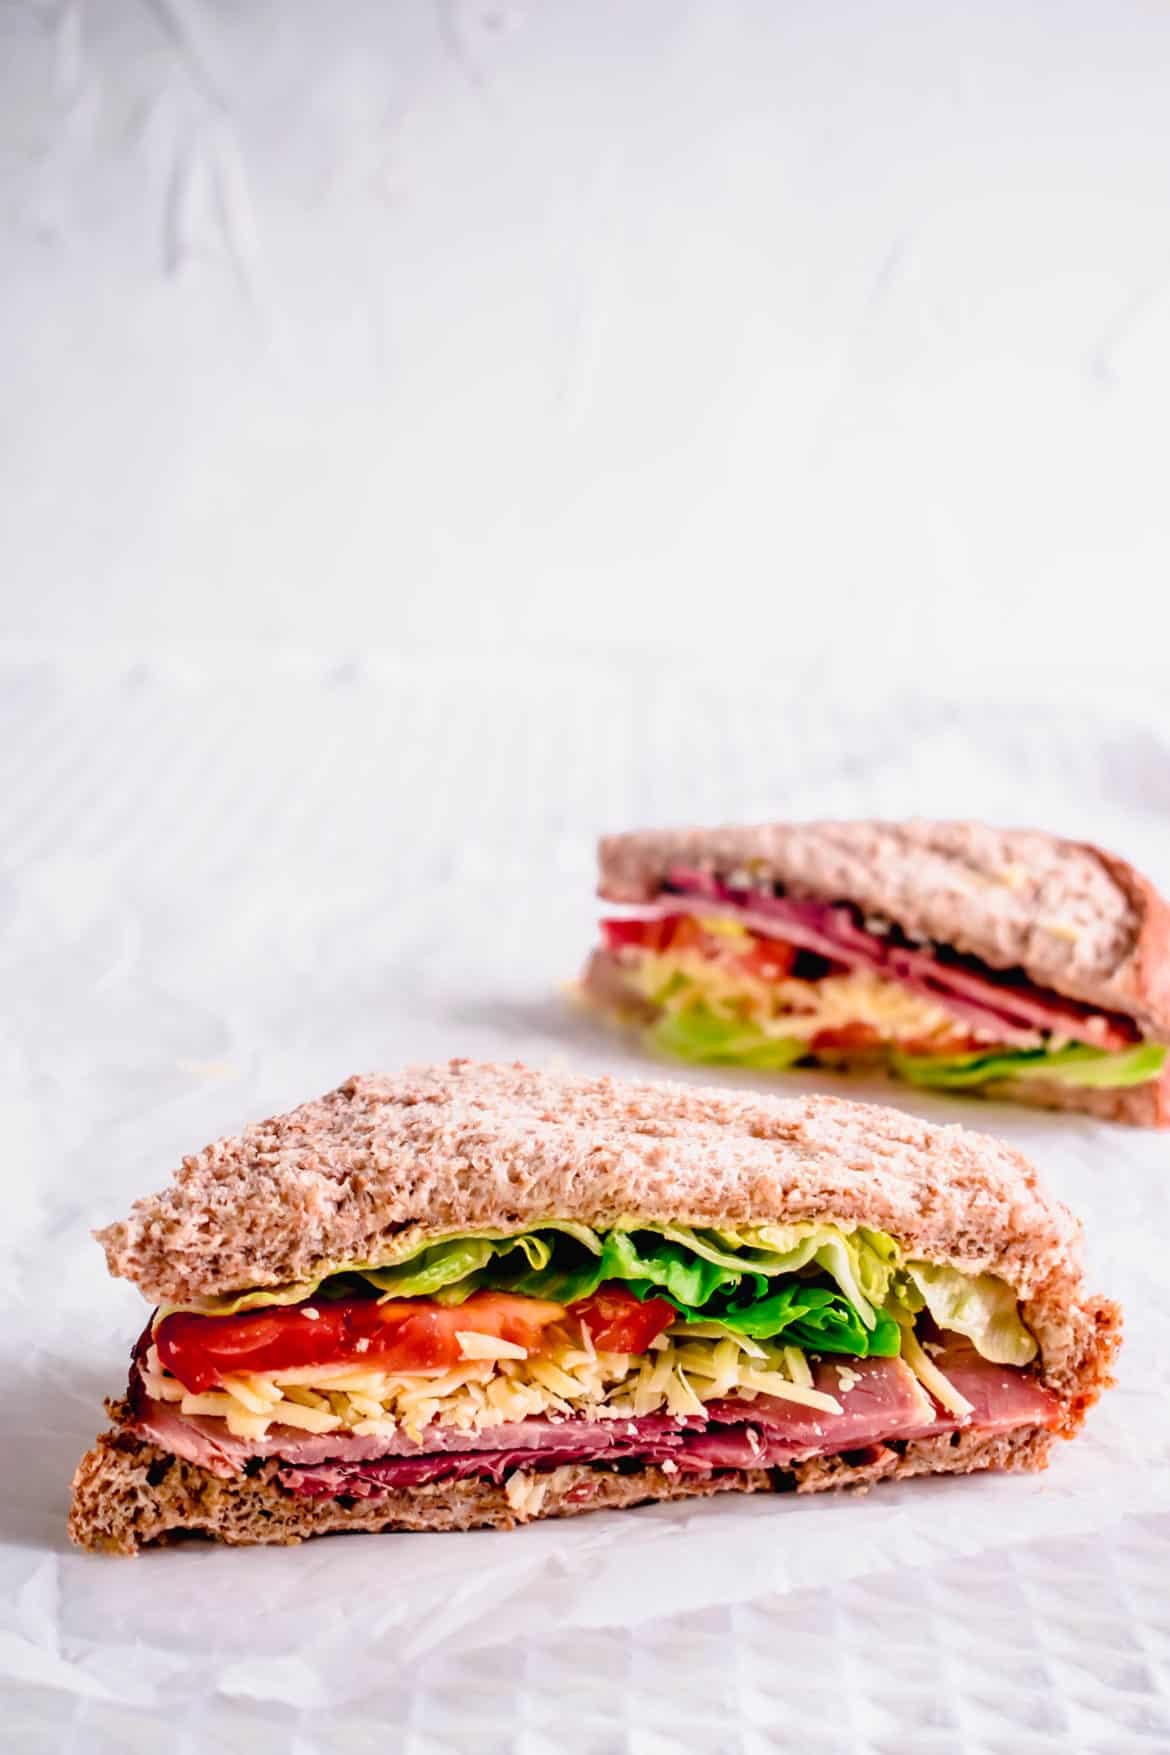 Ploughmans Sandwich Recipe